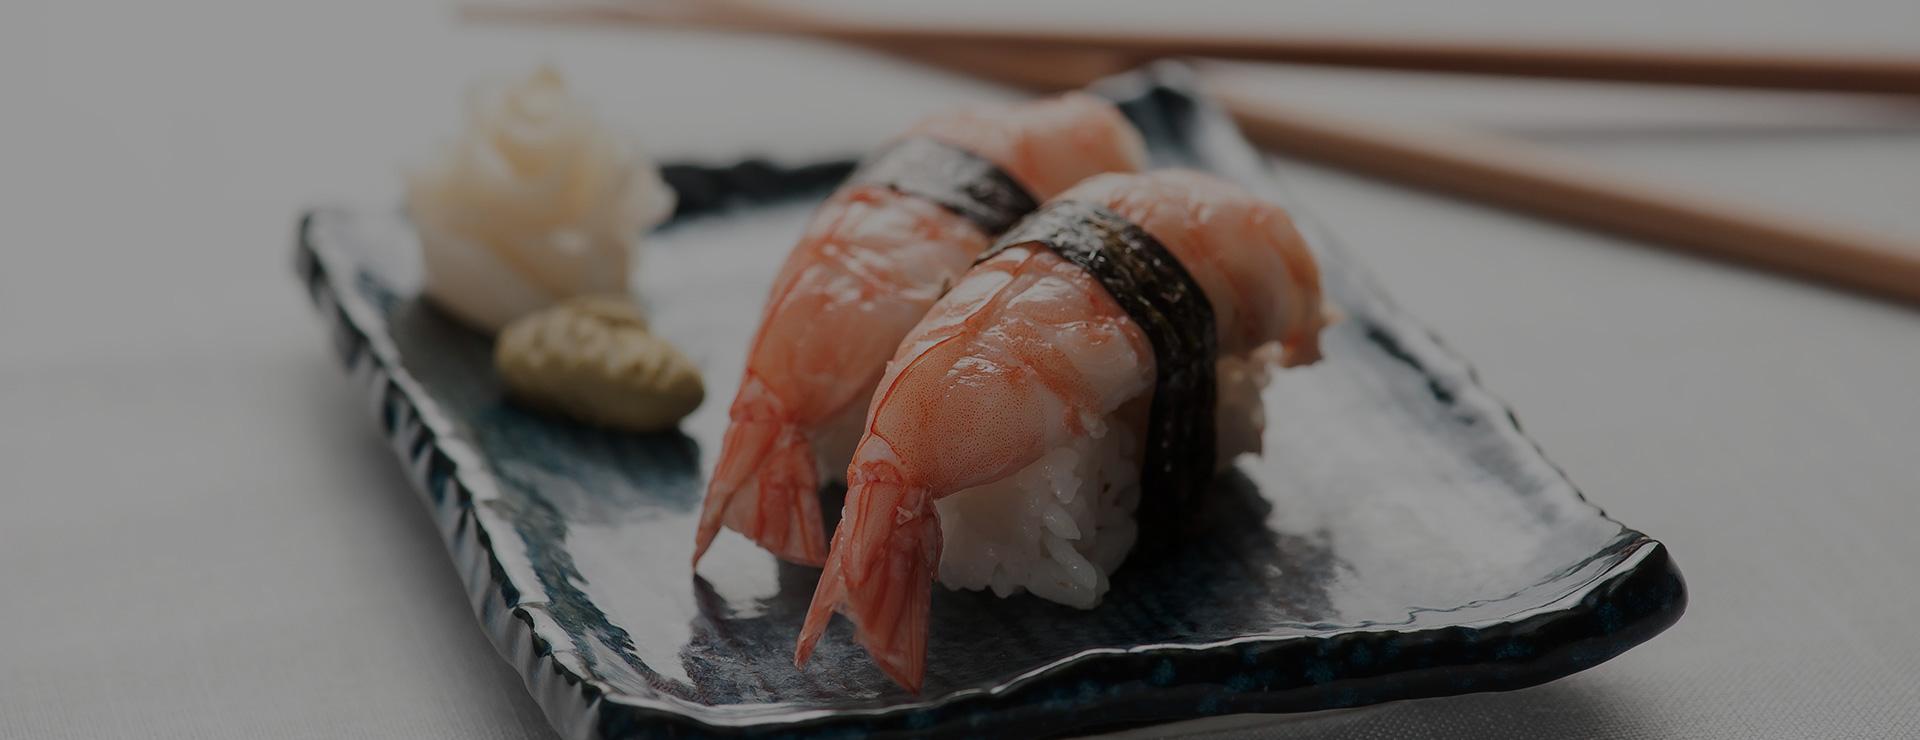 The Nami Sushi Web Build Story!